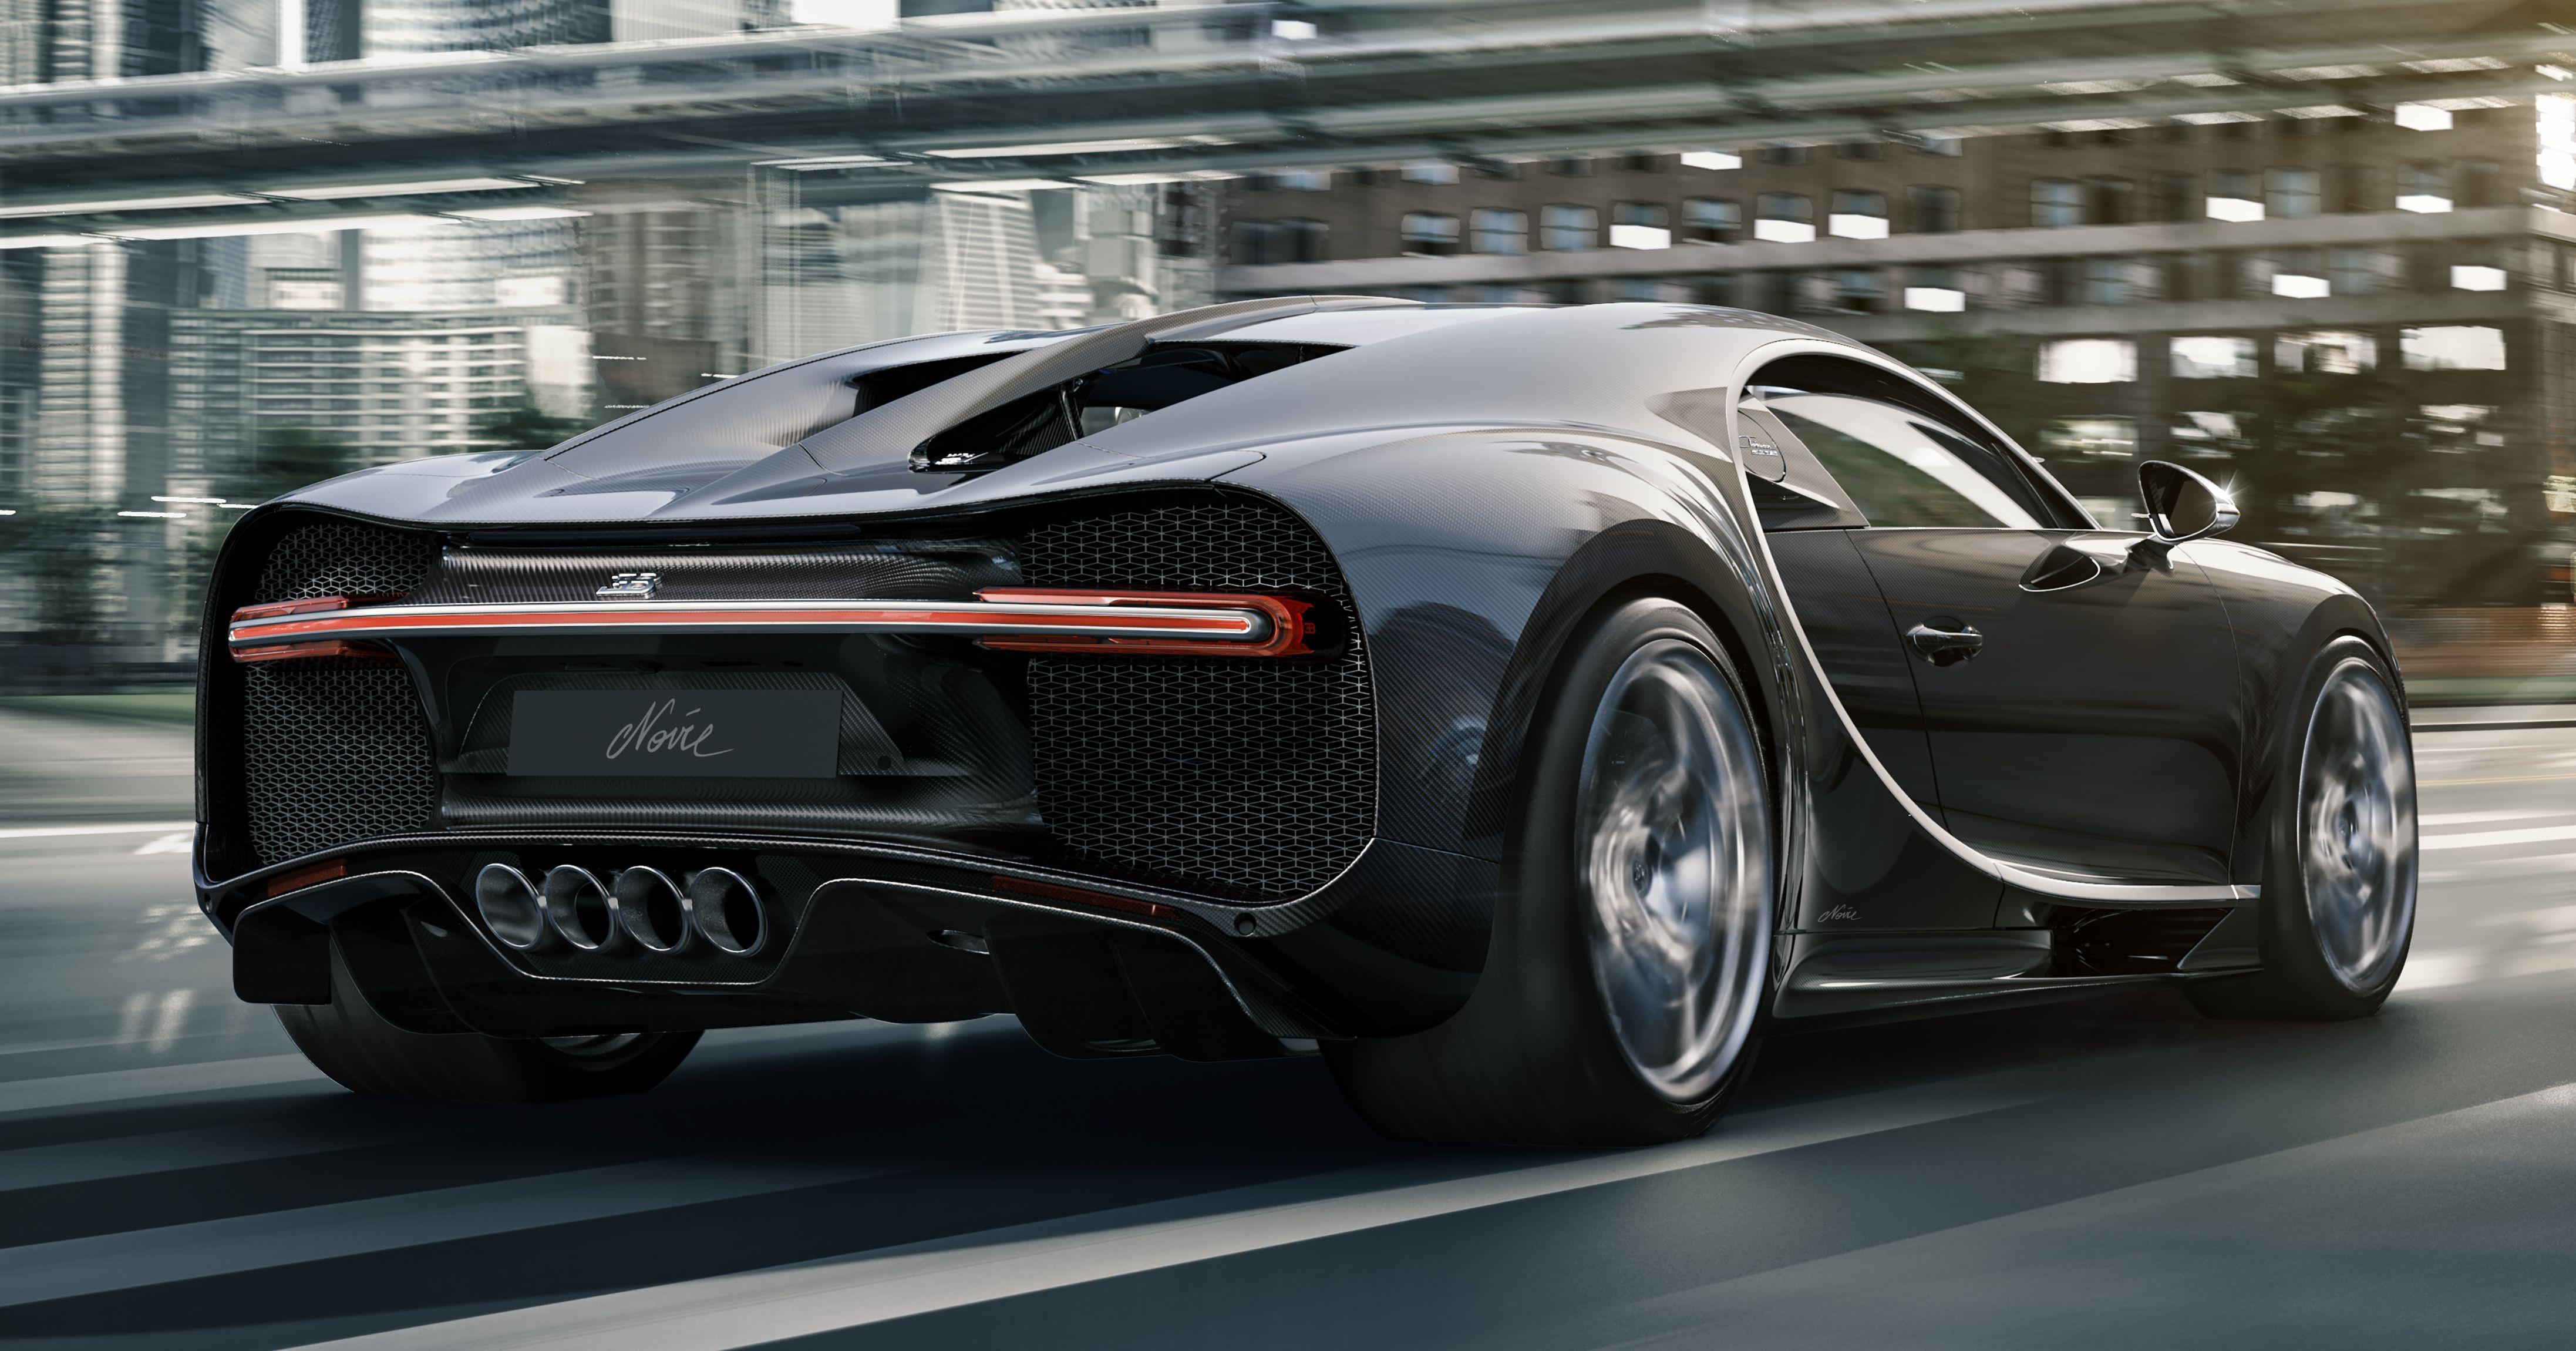 bugatti-chiron-noire-gloss-e1575339713246.jpg